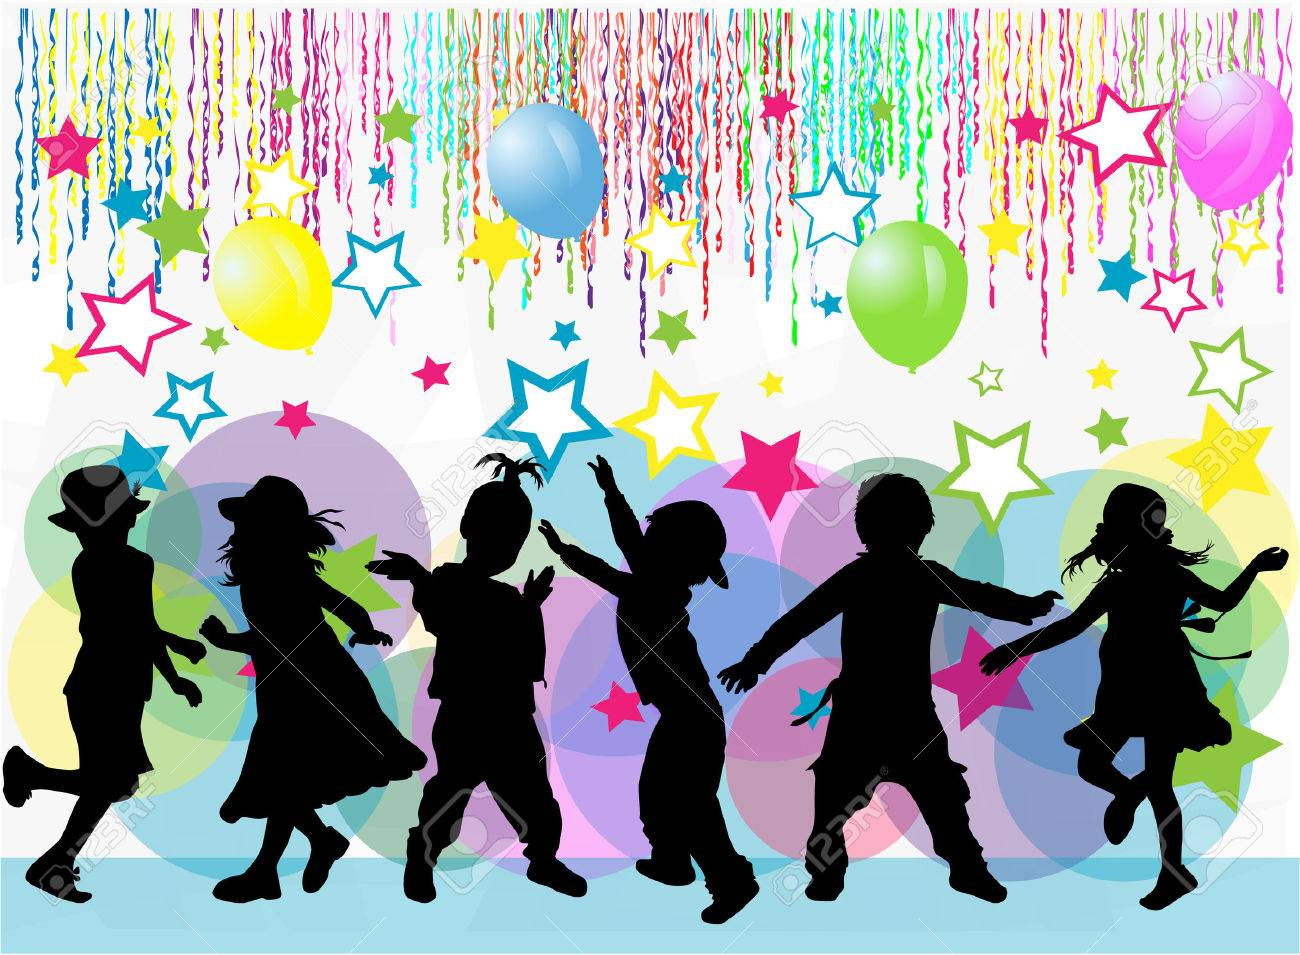 children silhouette - 34626690